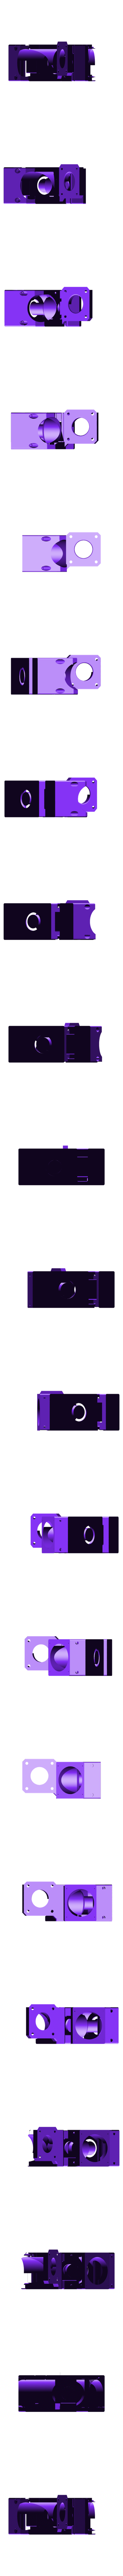 a6_hotend_1.stl Download free STL file Anet A6 J-Hotend mod • 3D printer object, Job